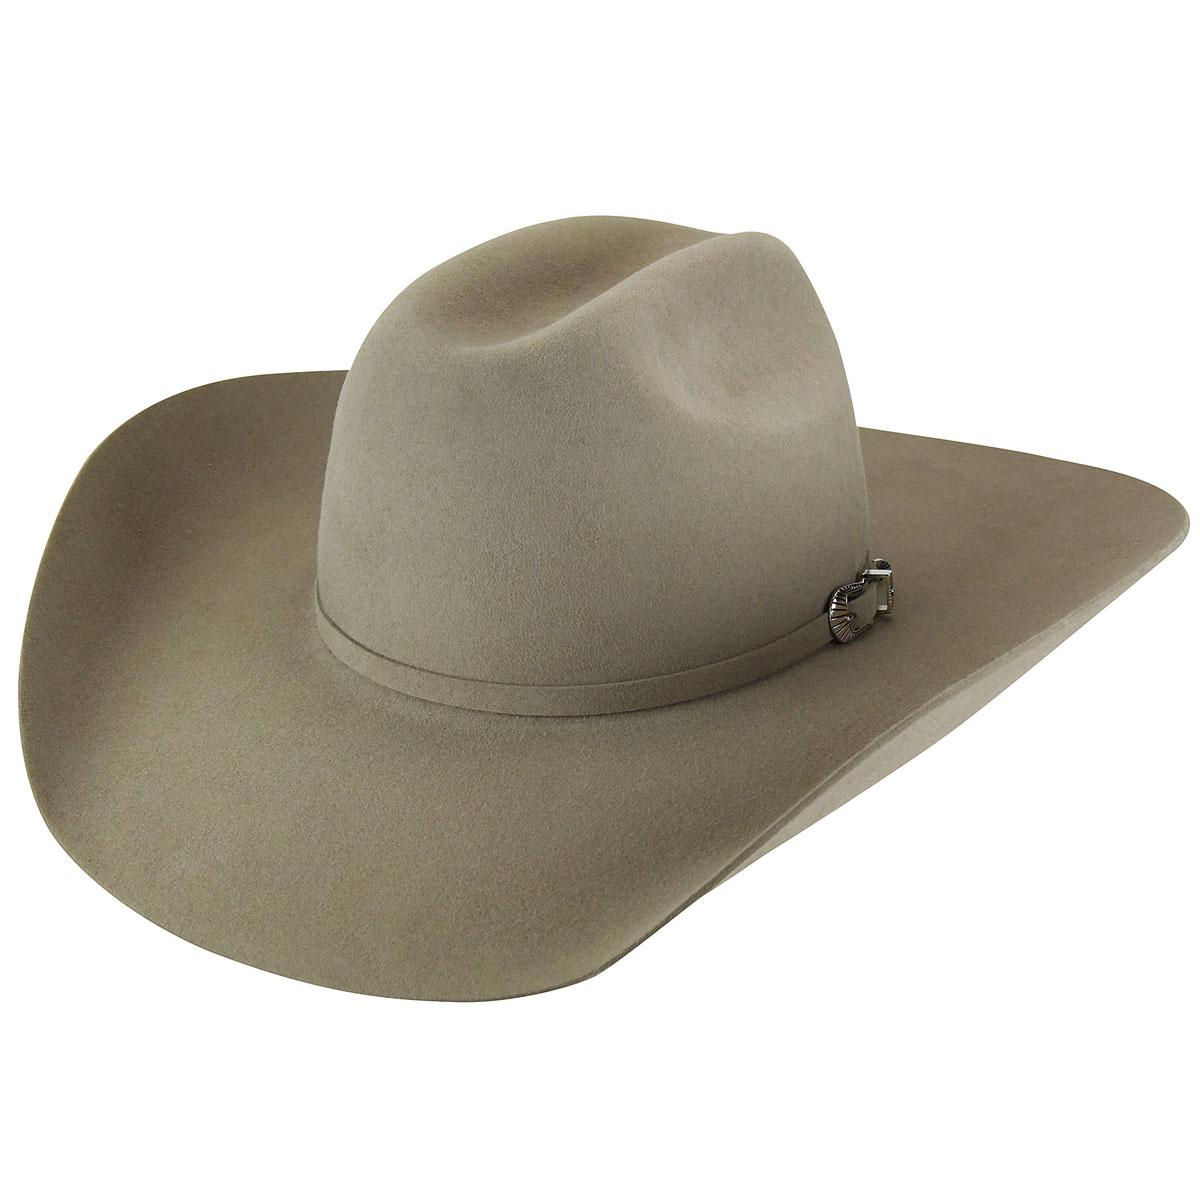 Seven 7X Fur Western Hat - Stone/7 1/2